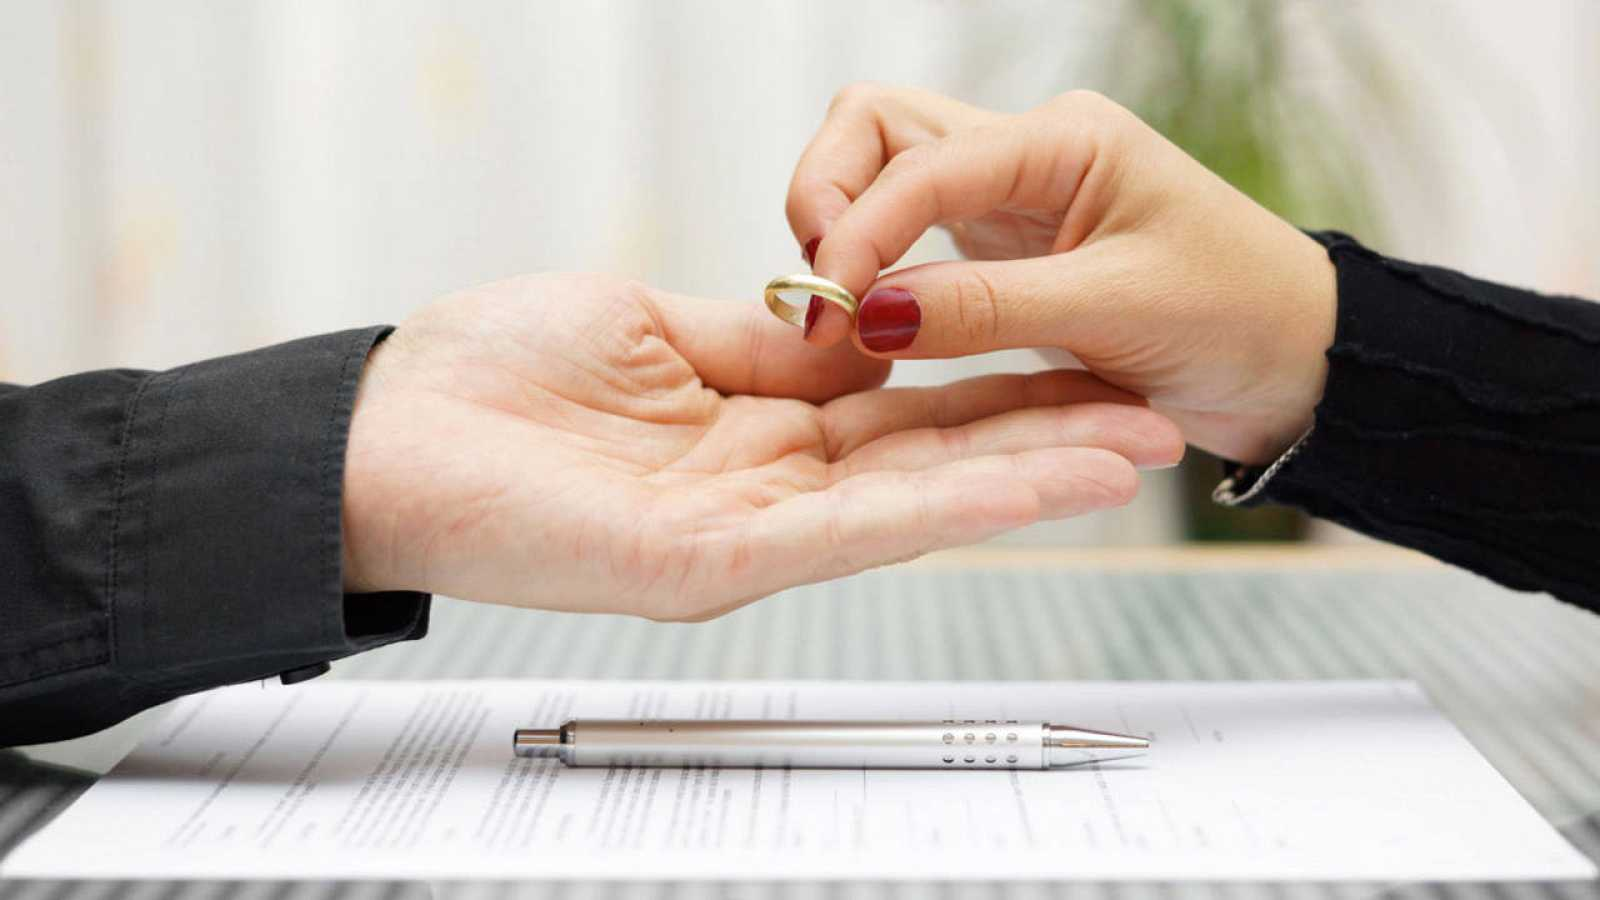 Matrimonio Catolico Disolucion : El obispo de bilbao firma la primera sentencia de nulidad